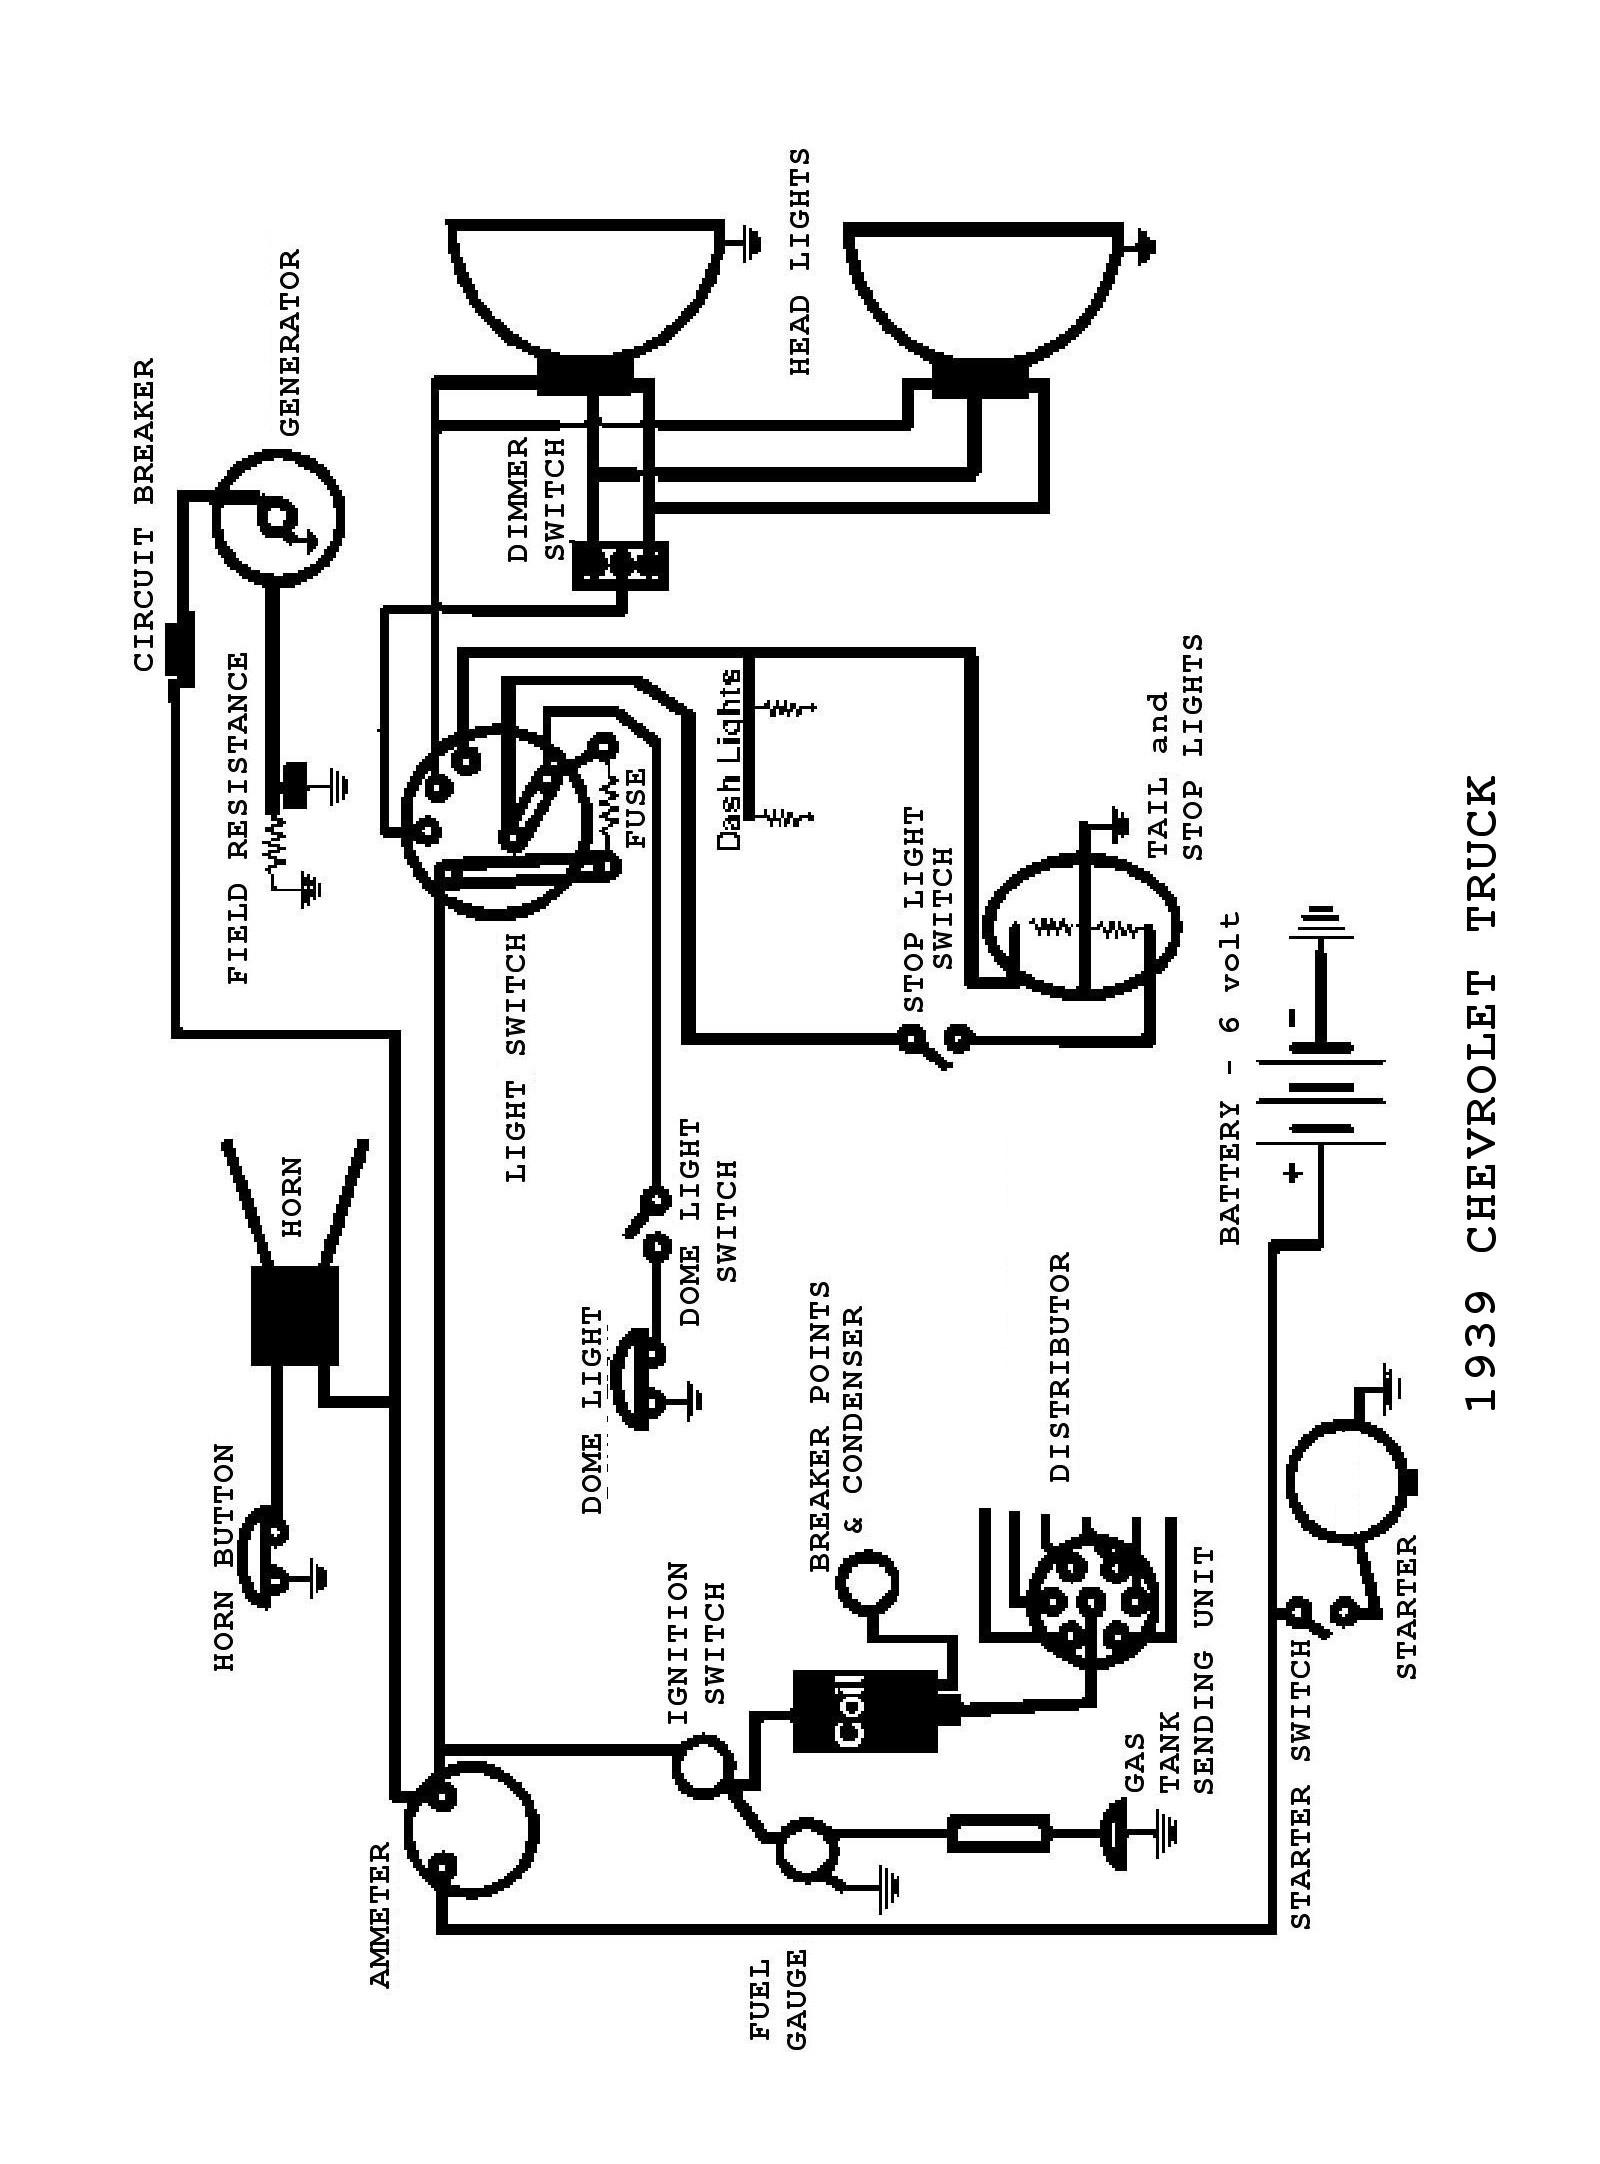 1977 dodge ignition wiring diagram mini usb free engine